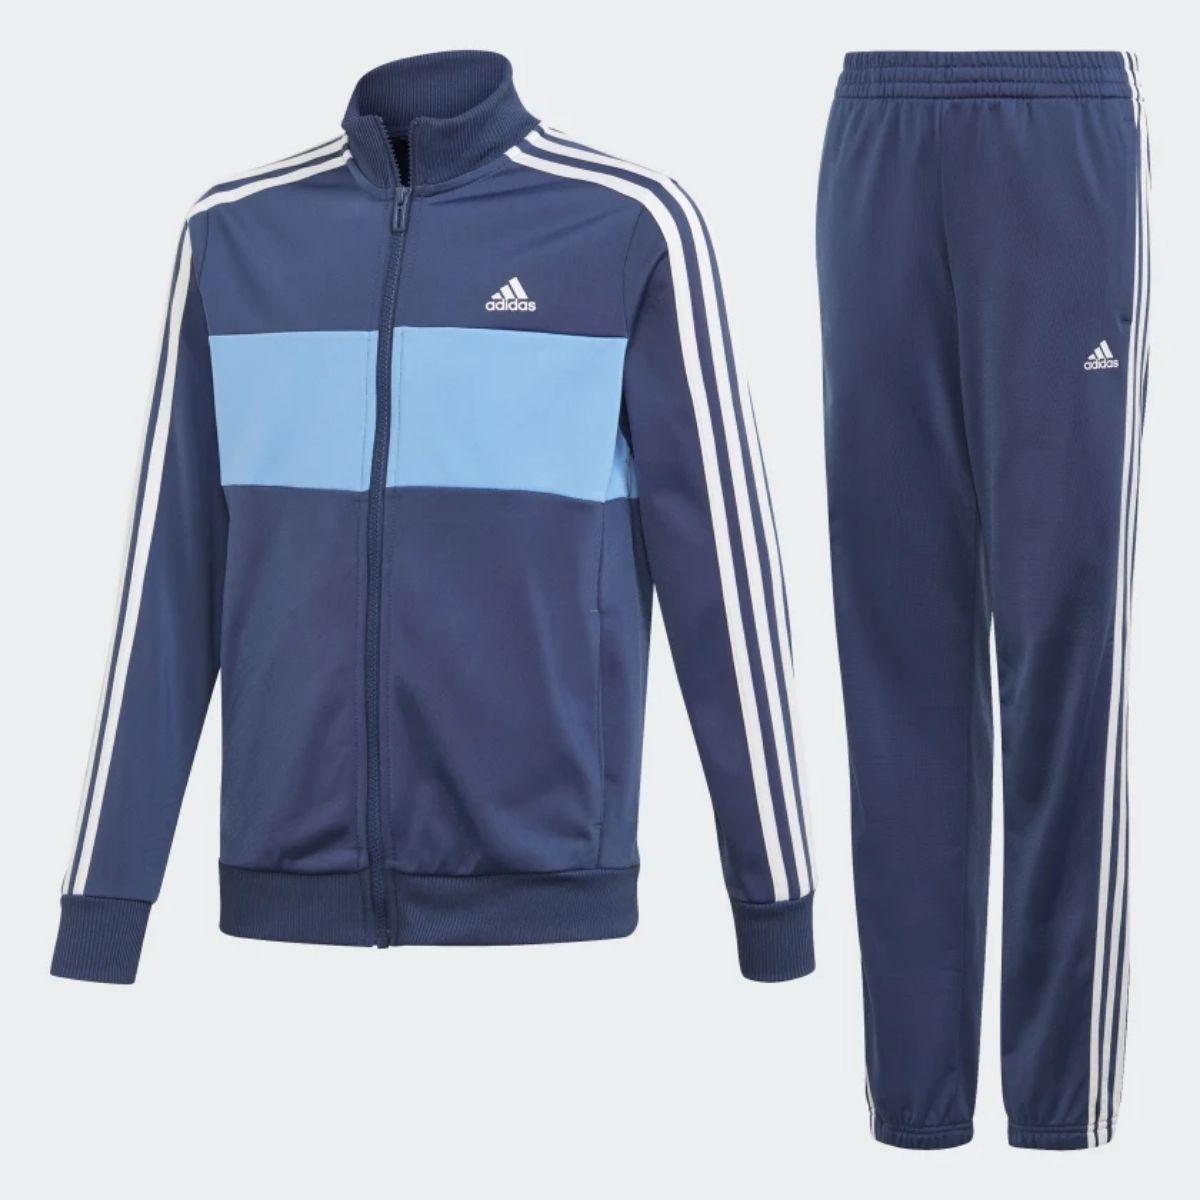 Tuta Adidas Cerniera...